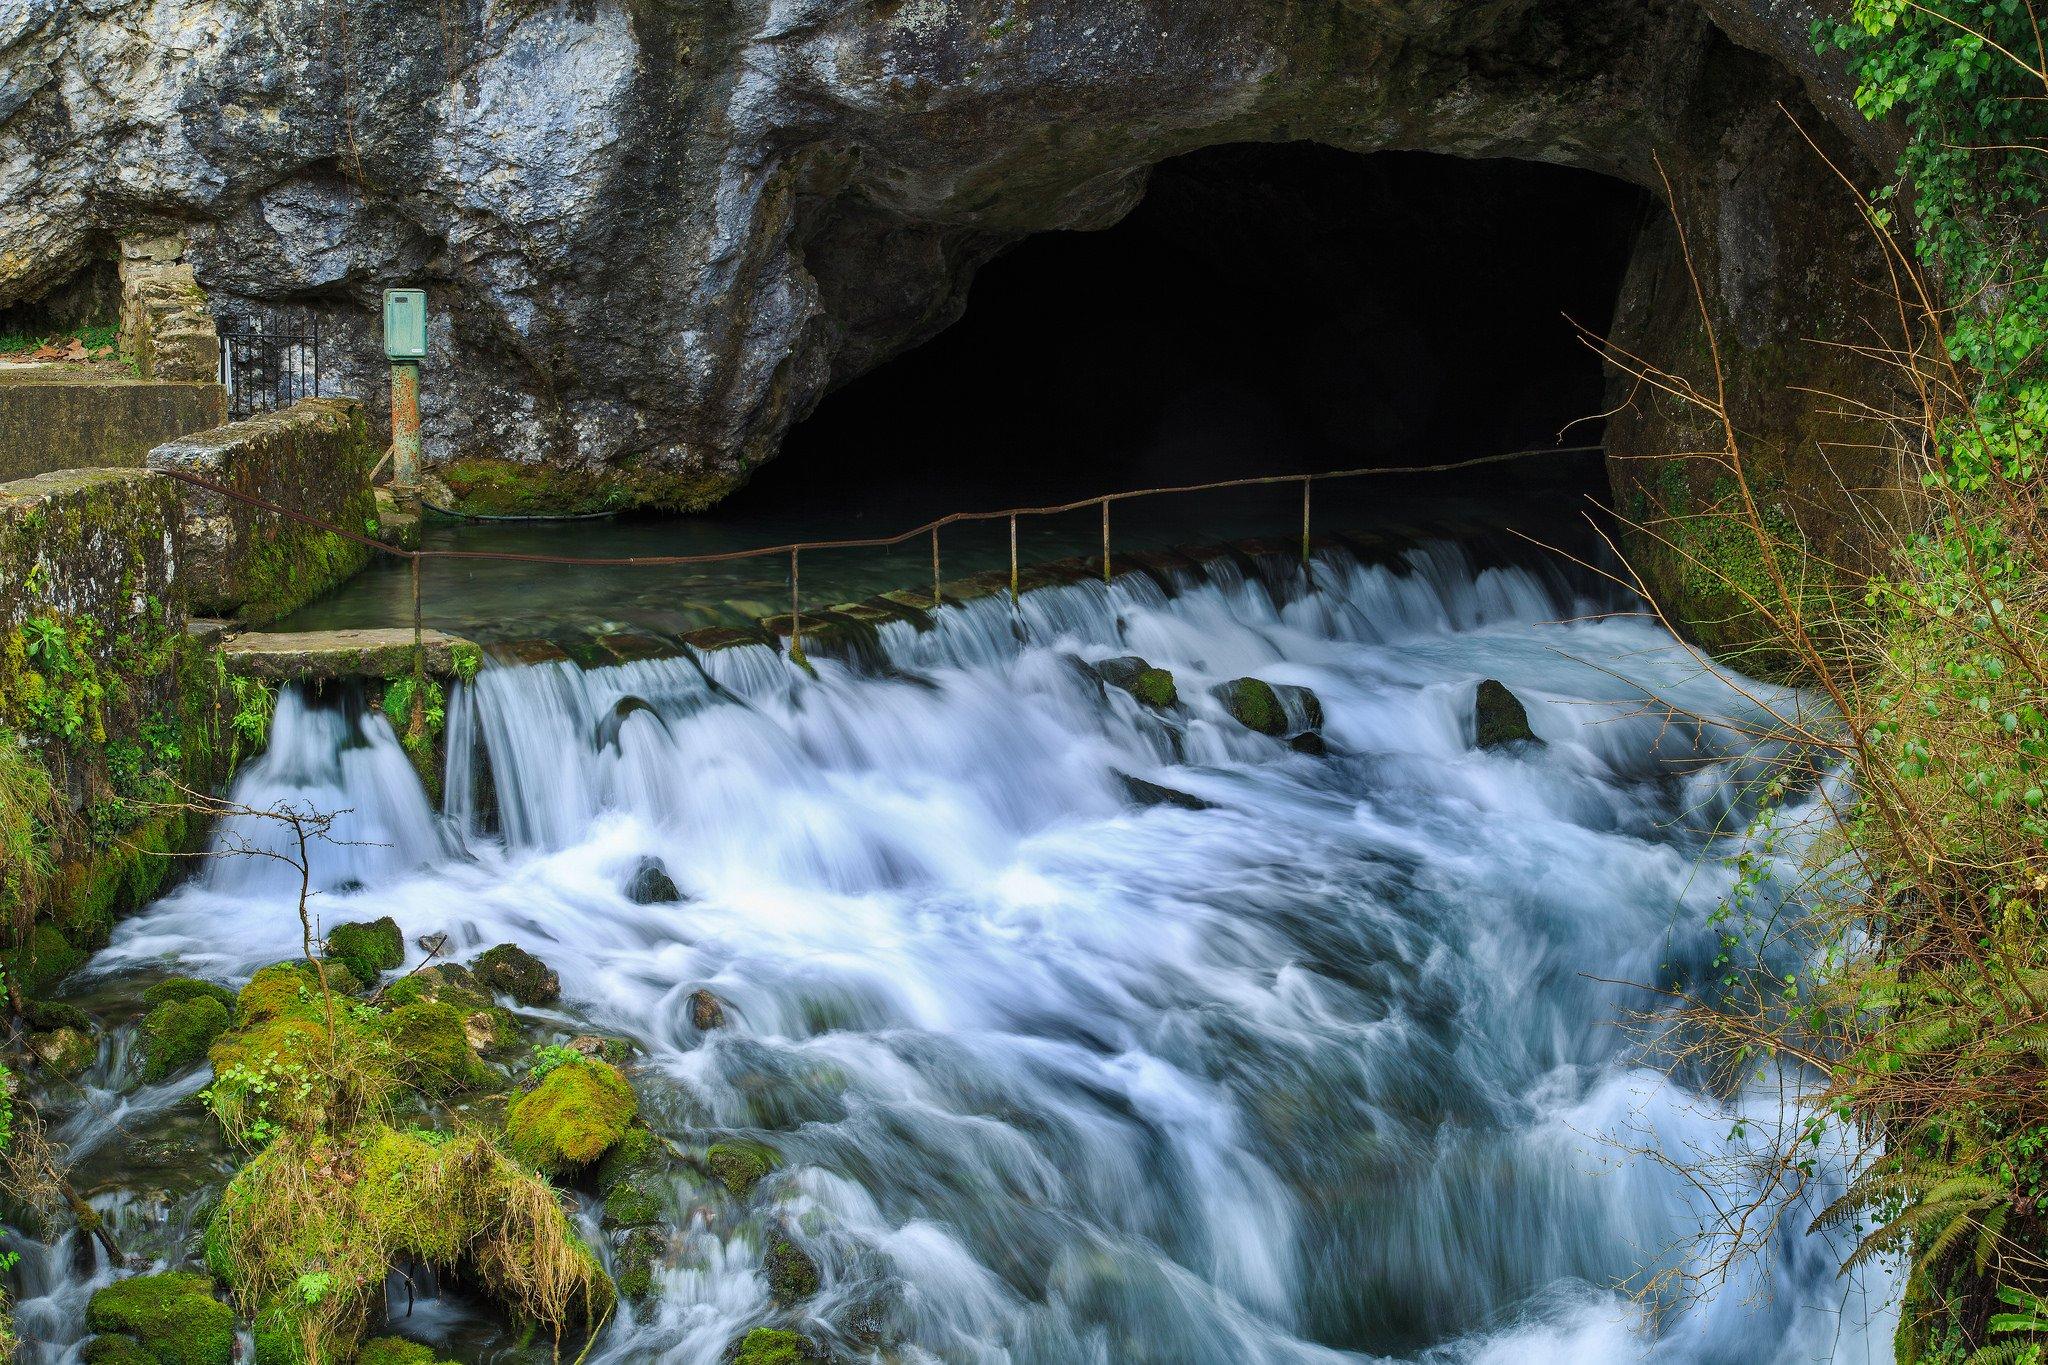 La fontaine intermittente de Fontestorbes